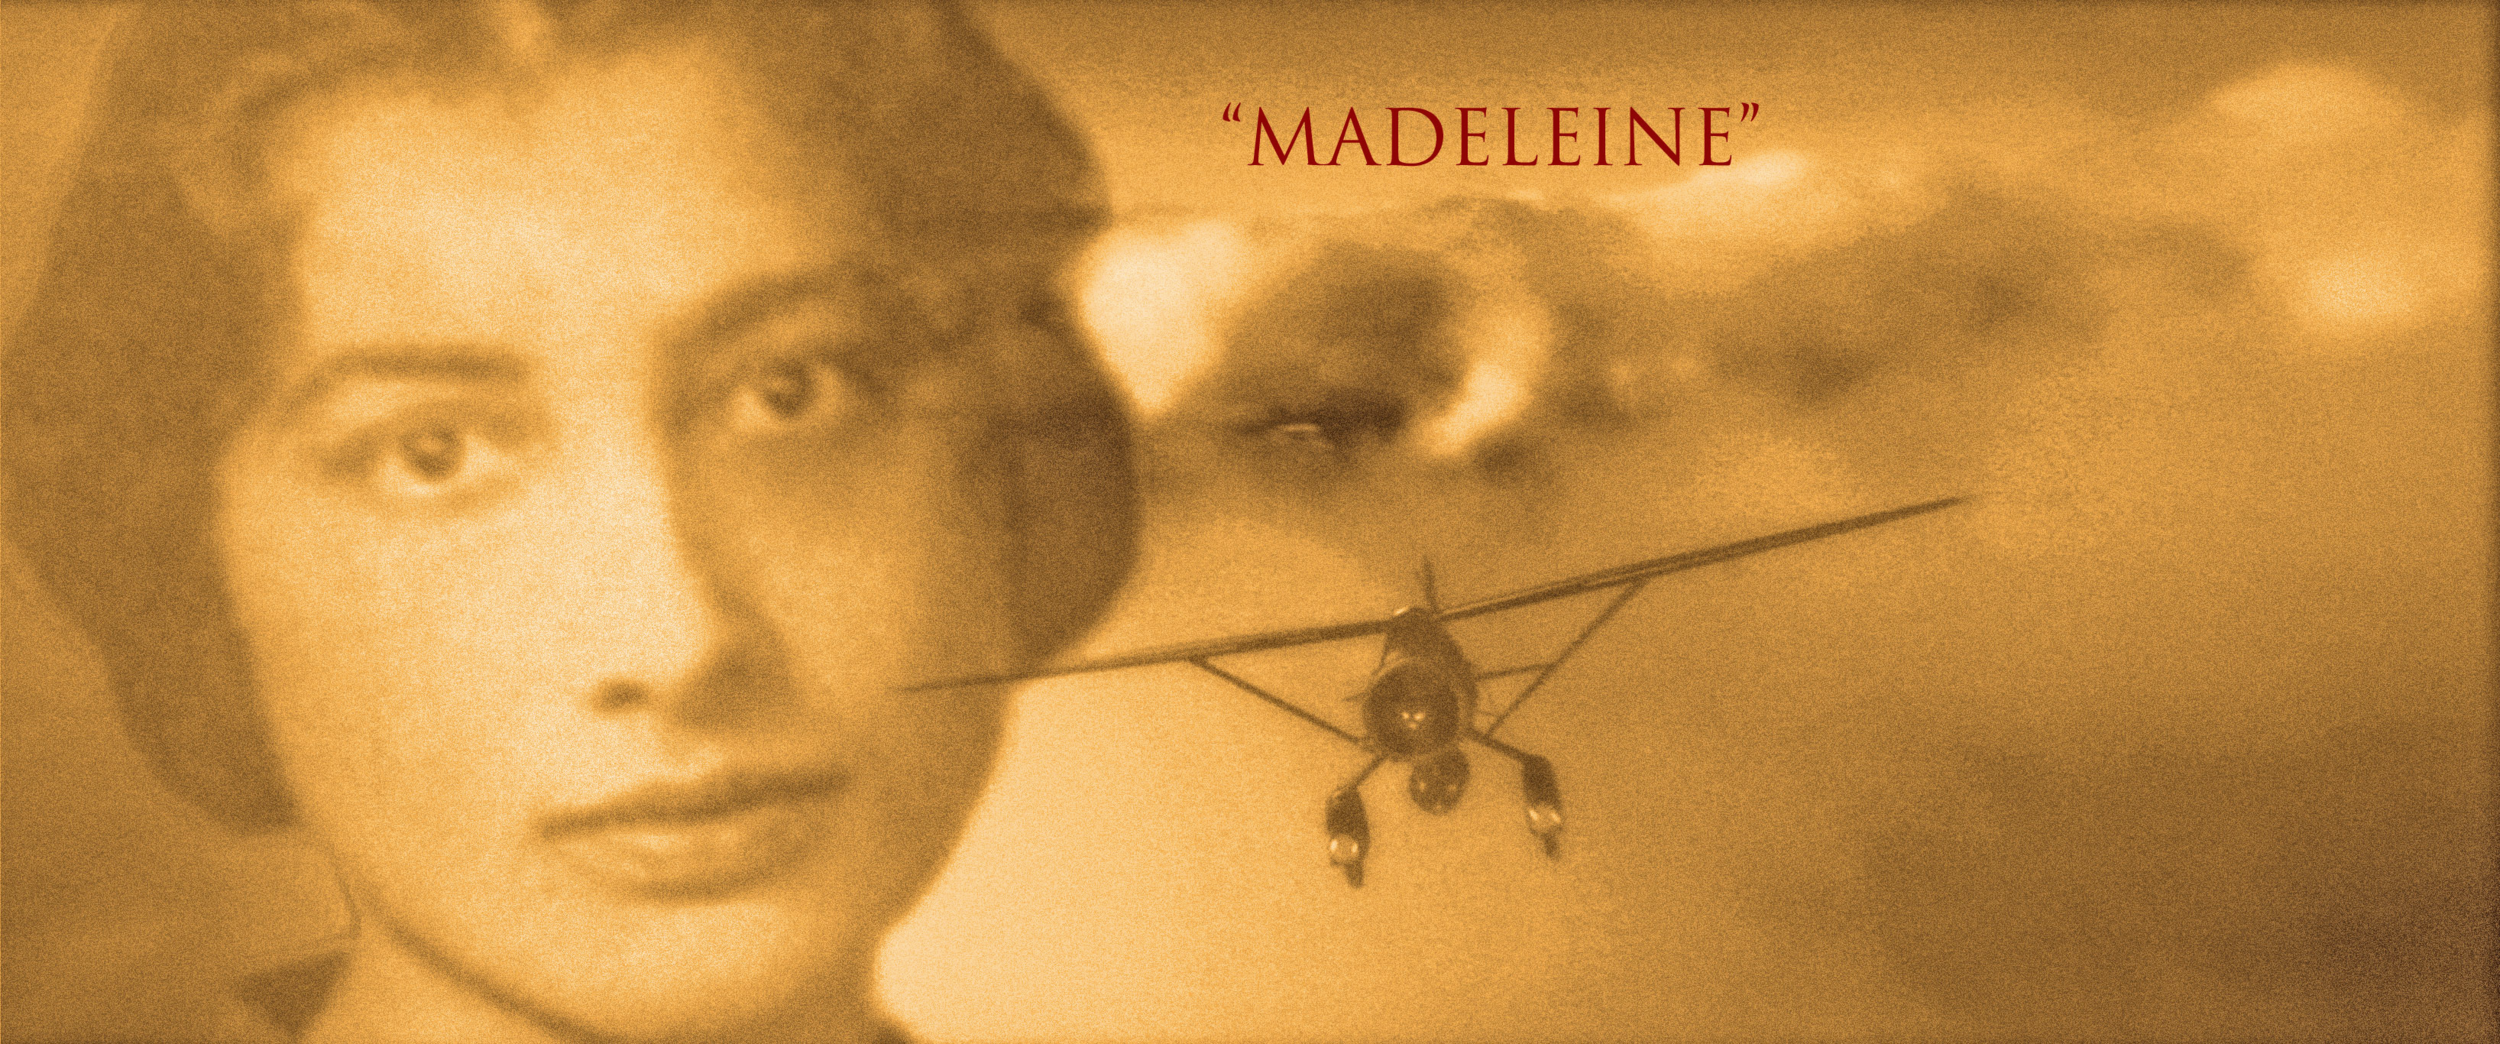 madeleine(high)jpg